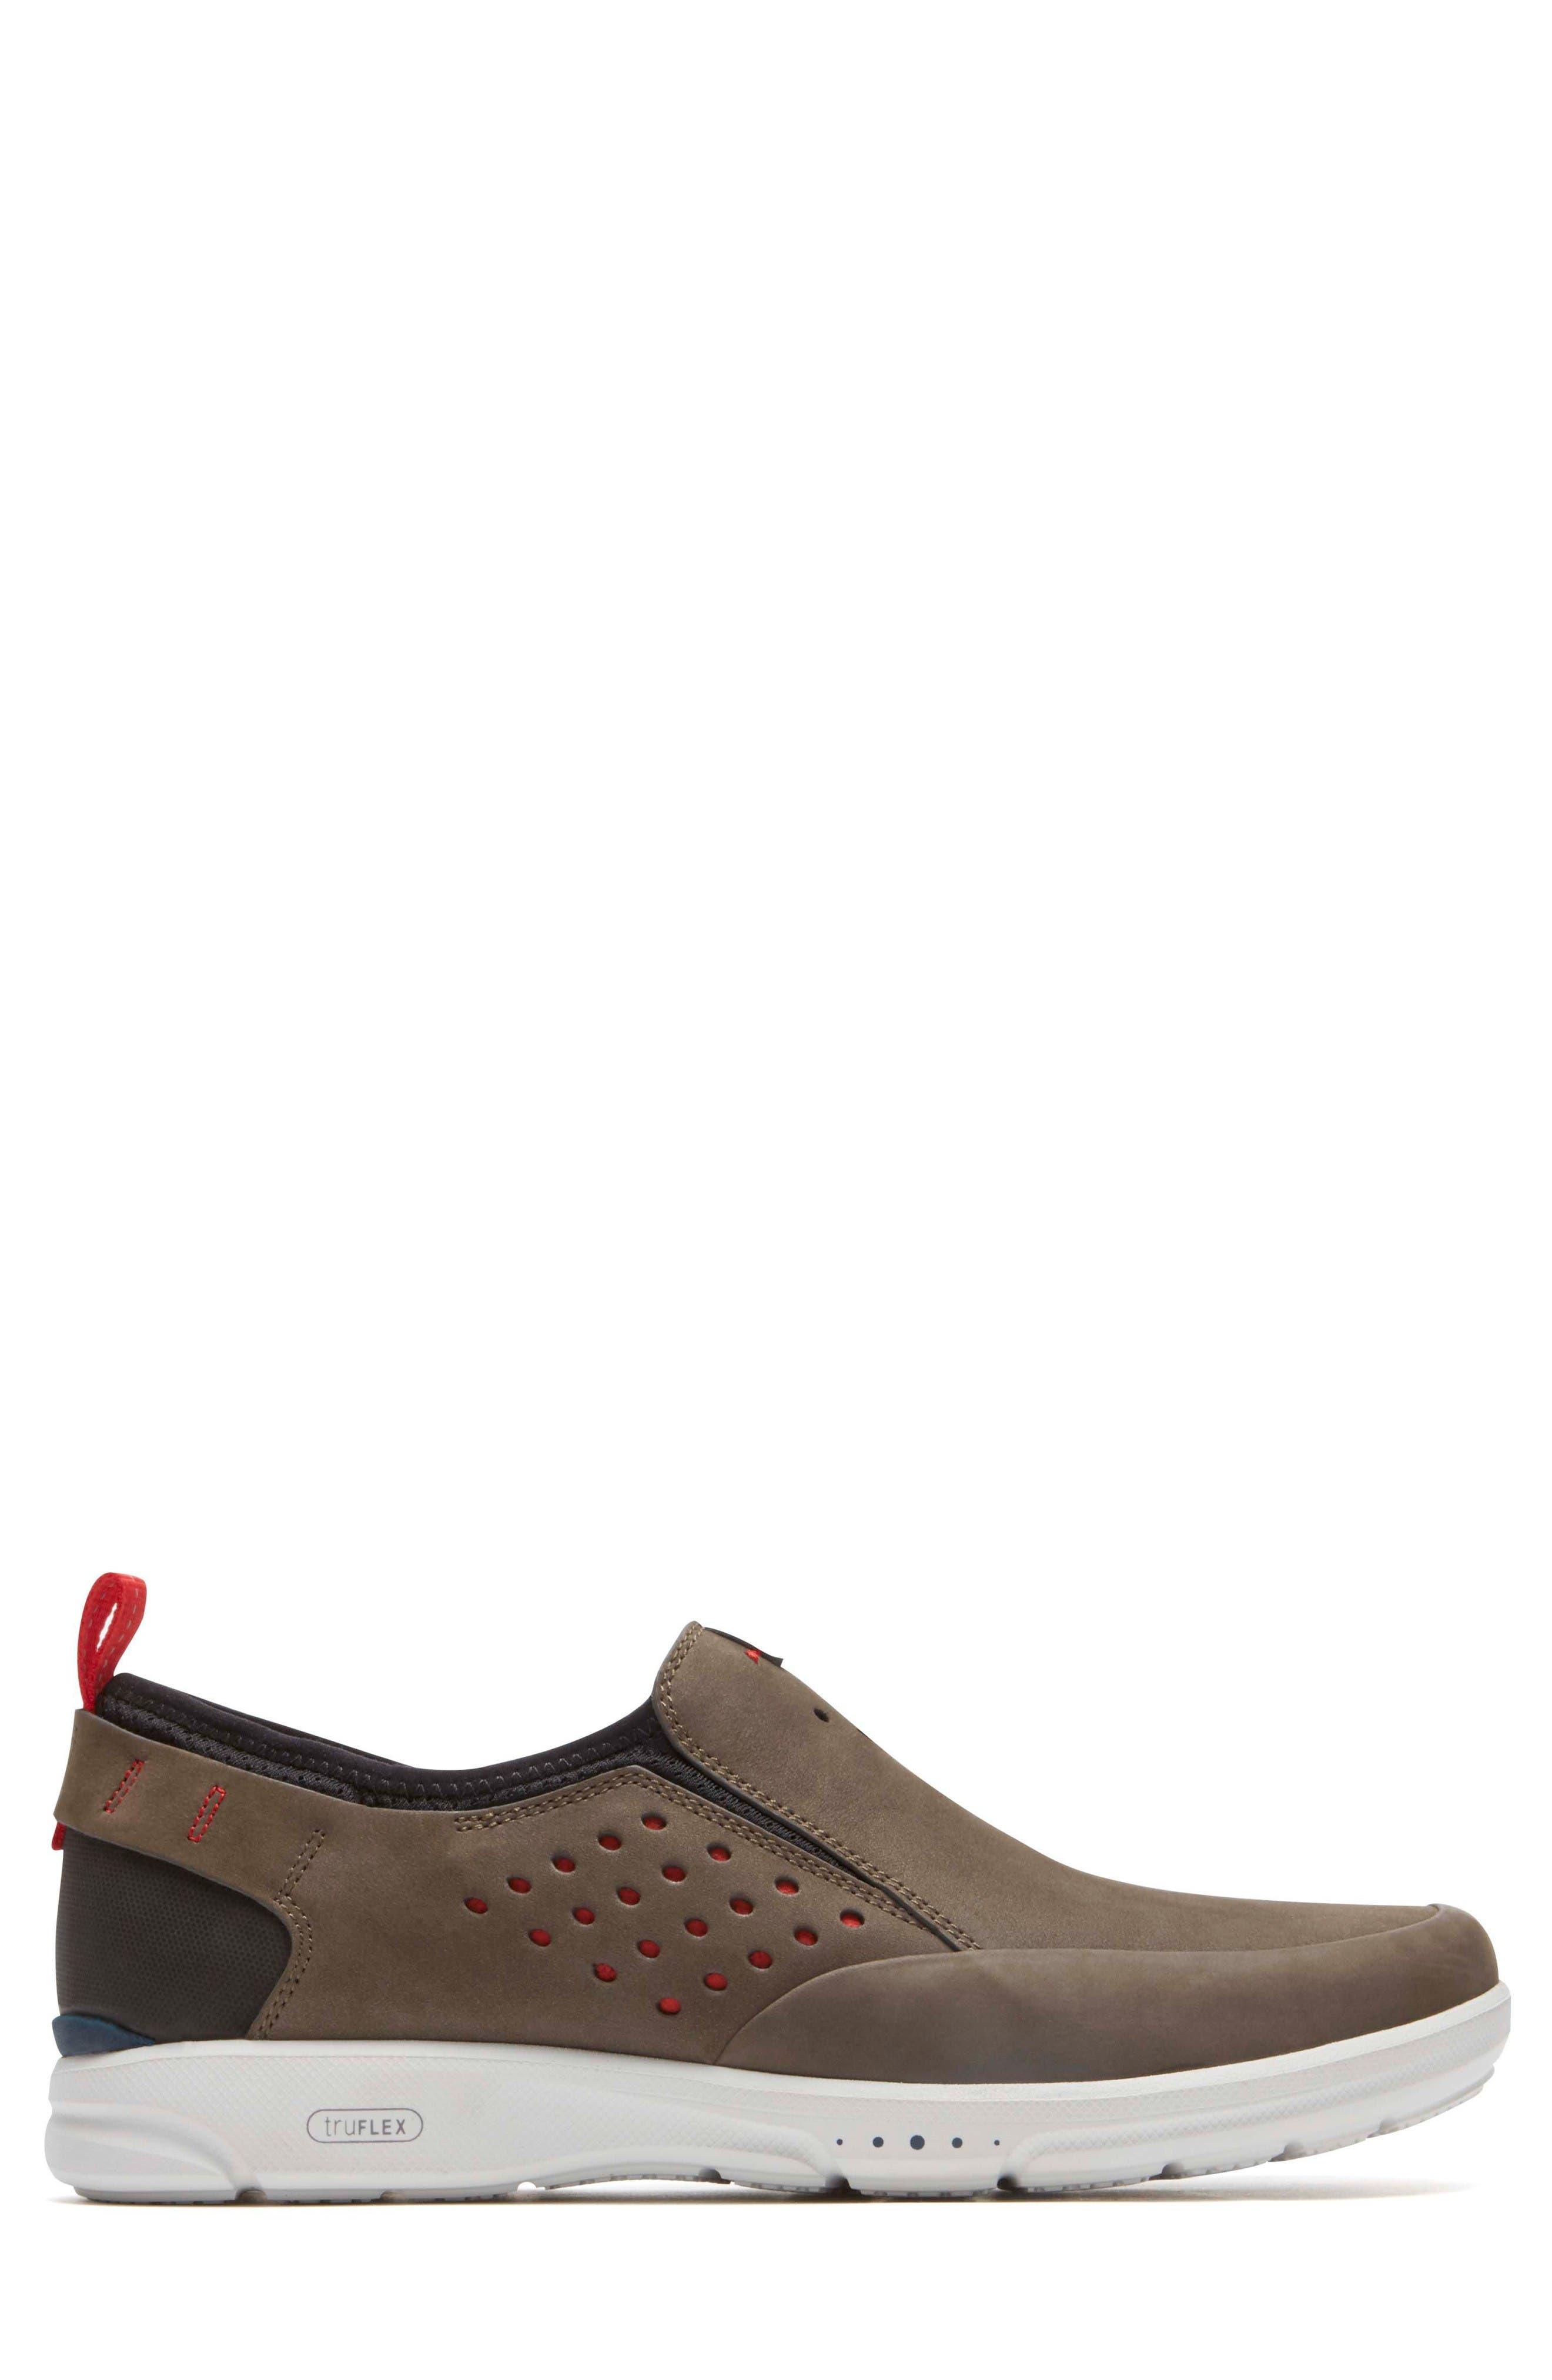 Truflex Slip-On,                             Alternate thumbnail 3, color,                             Dark Olive Leather